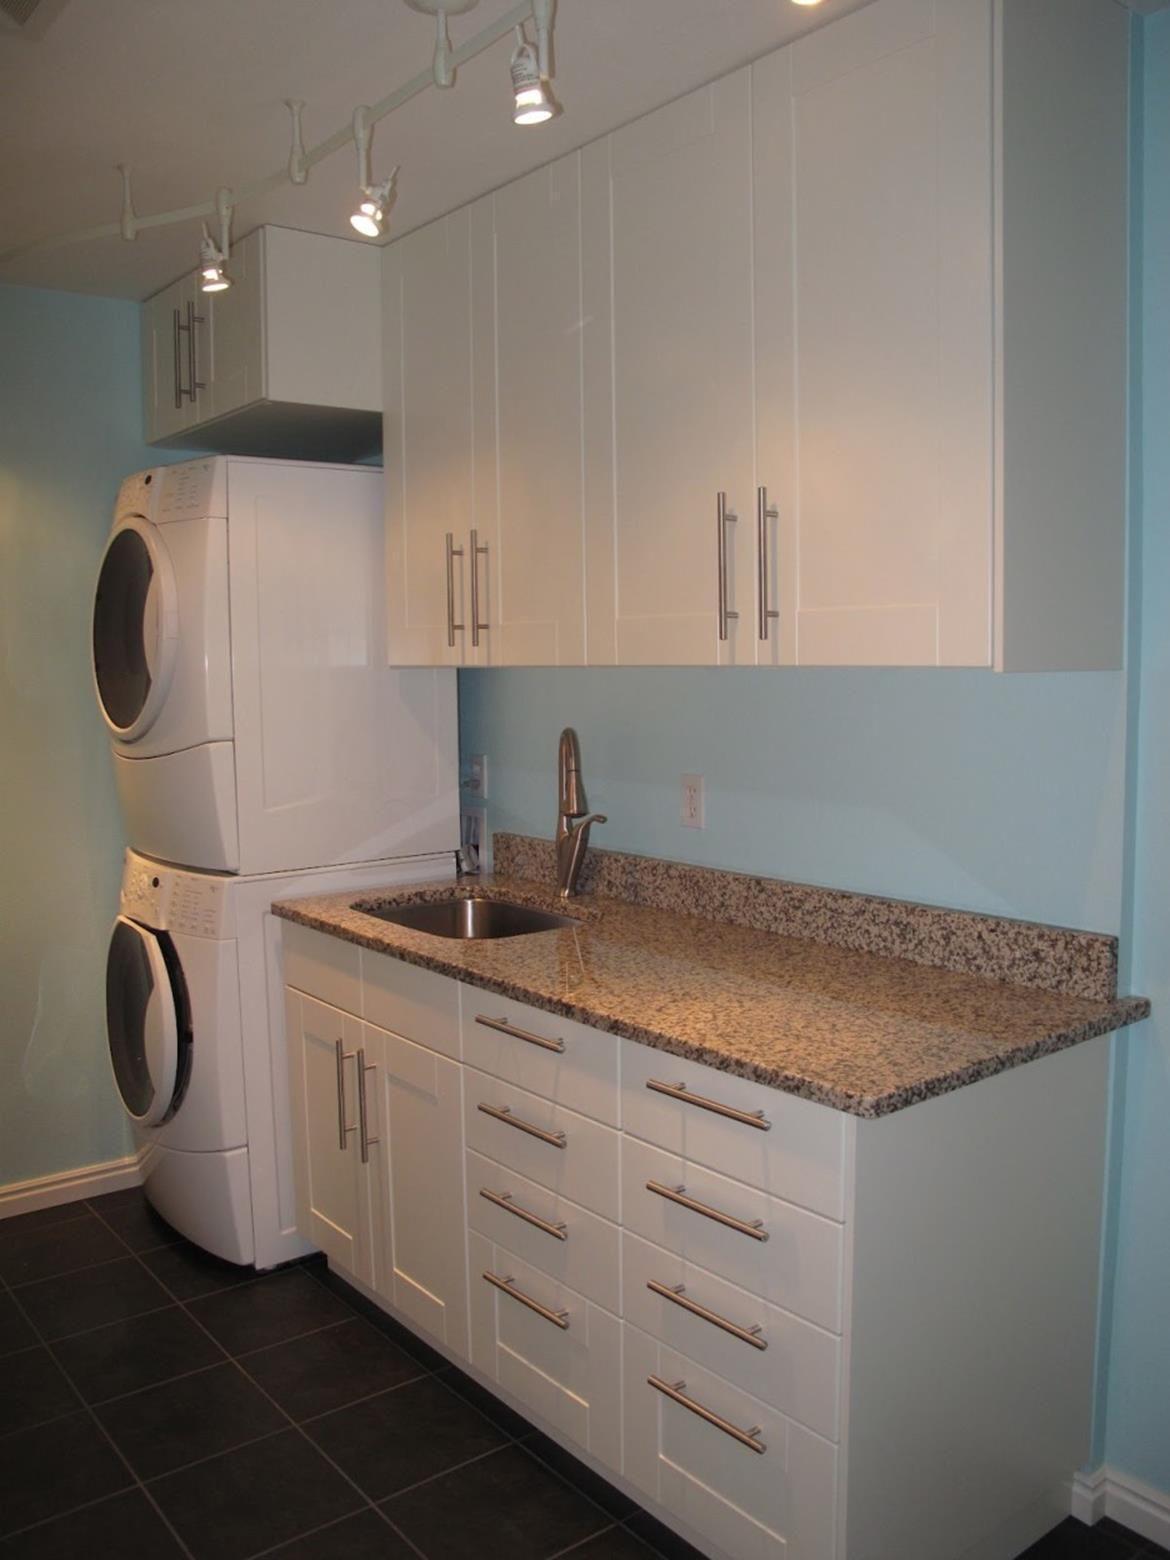 Best Cheap Ikea Cabinets Laundry Room Storage Ideas 35 400 x 300